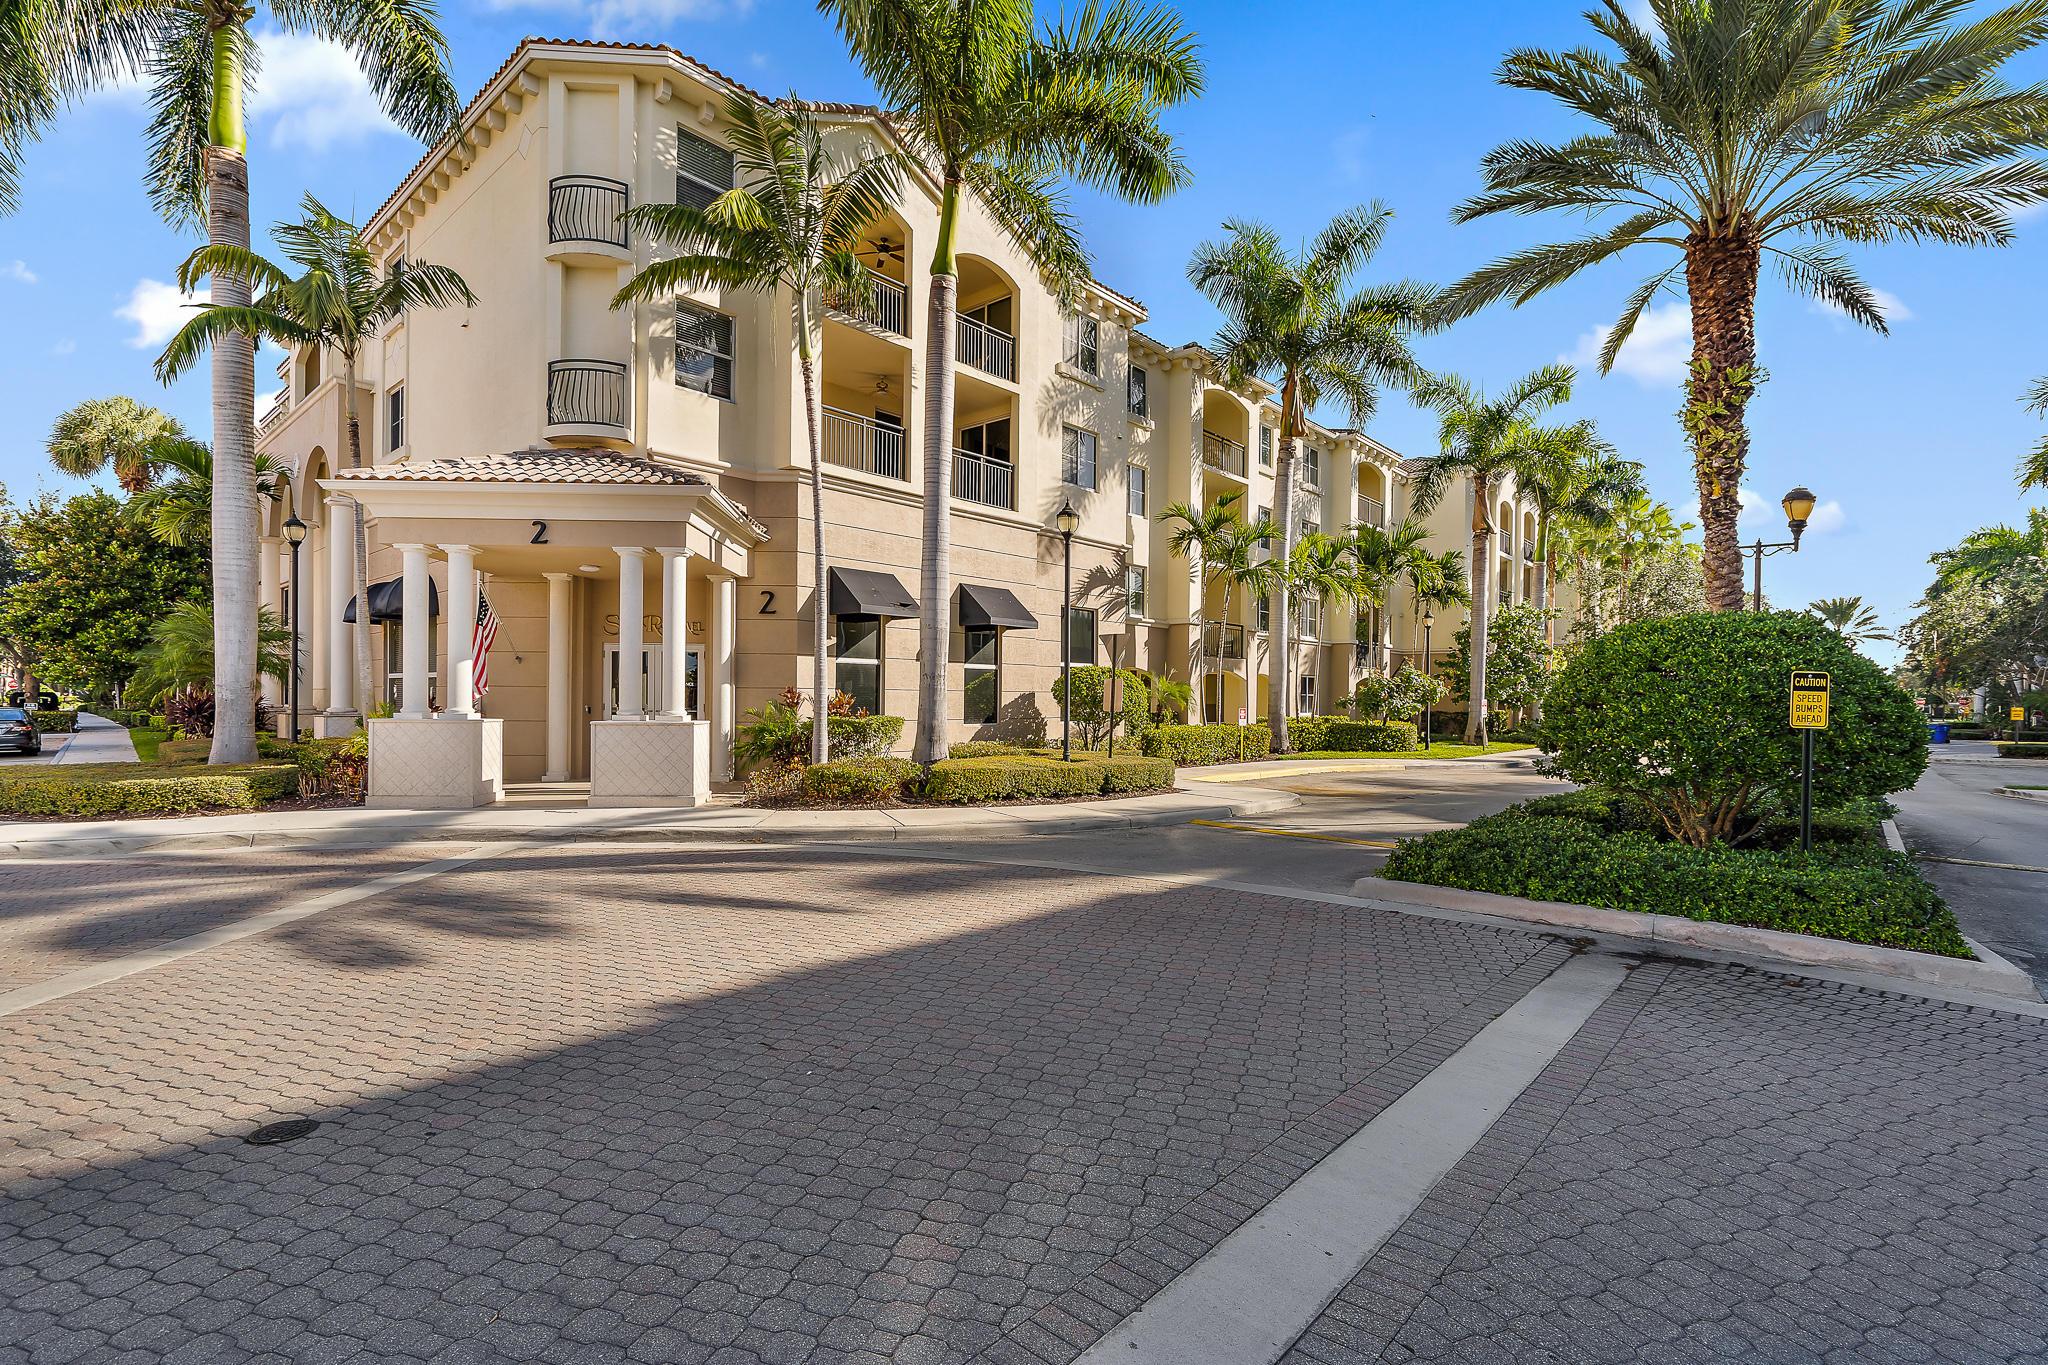 1208 Renaissance Way 208 Boynton Beach, FL 33426